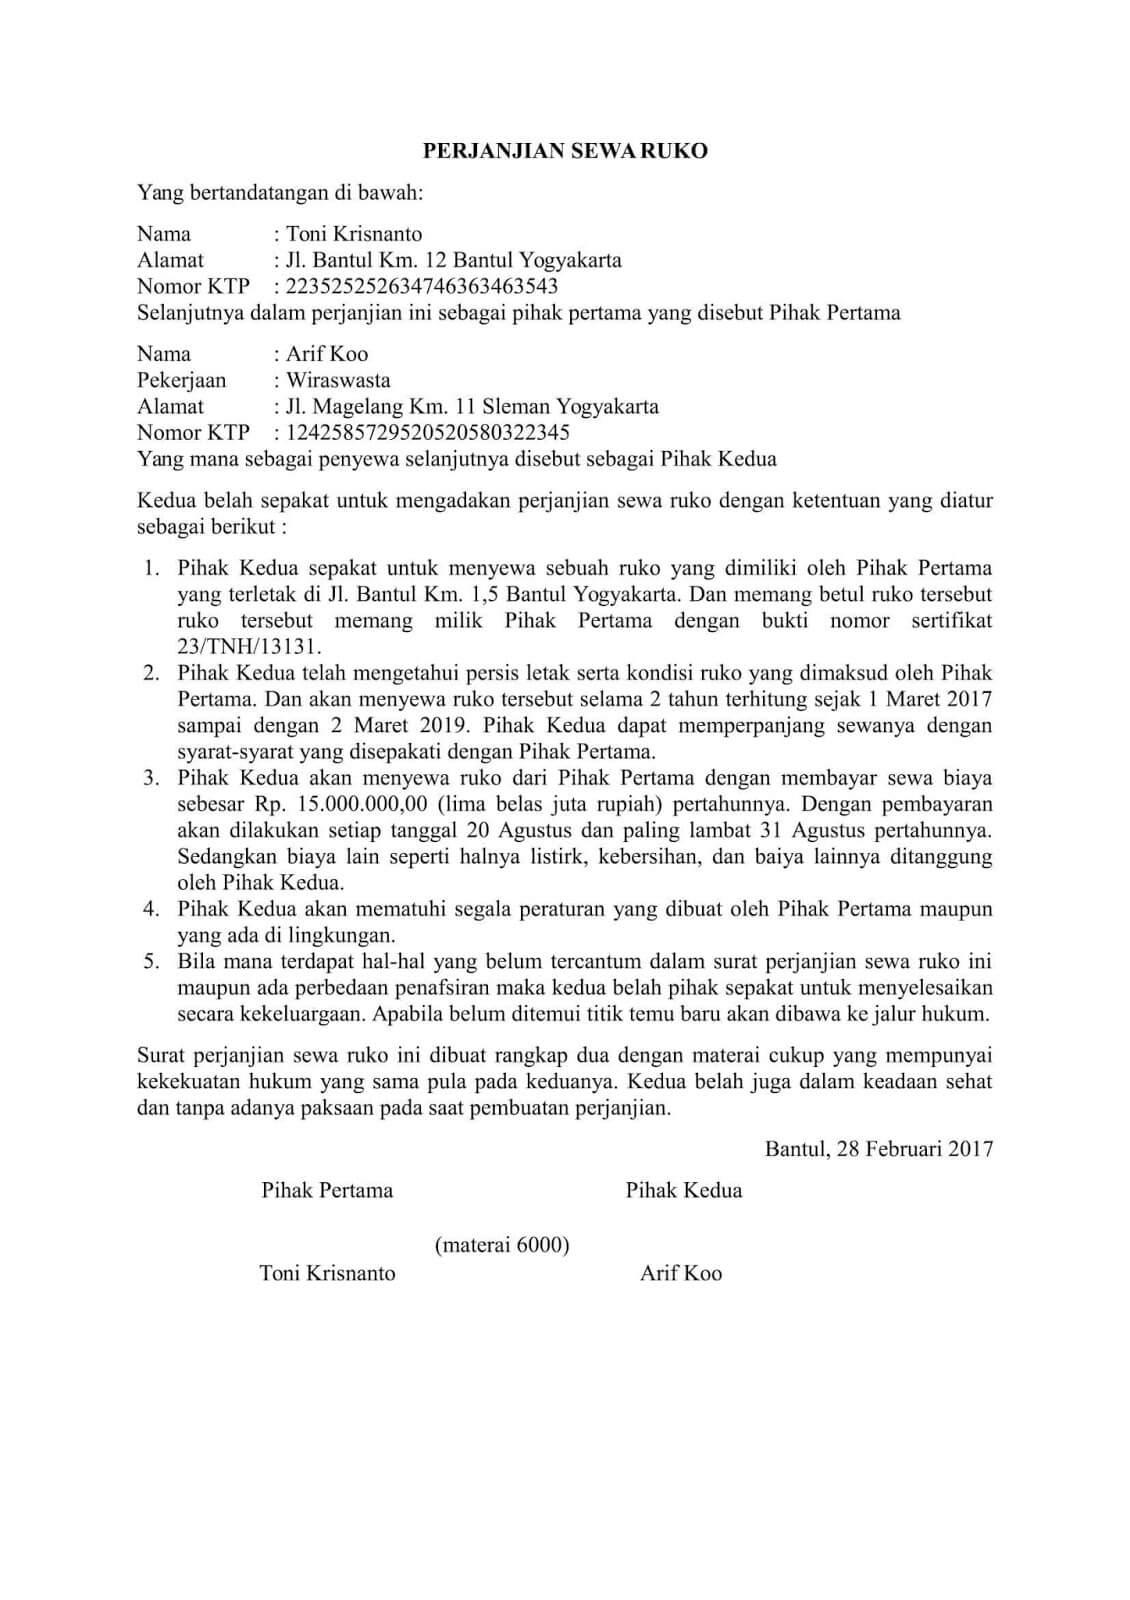 Surat Perjanjian Sewa Ruko Doc Guru Ilmu Sosial